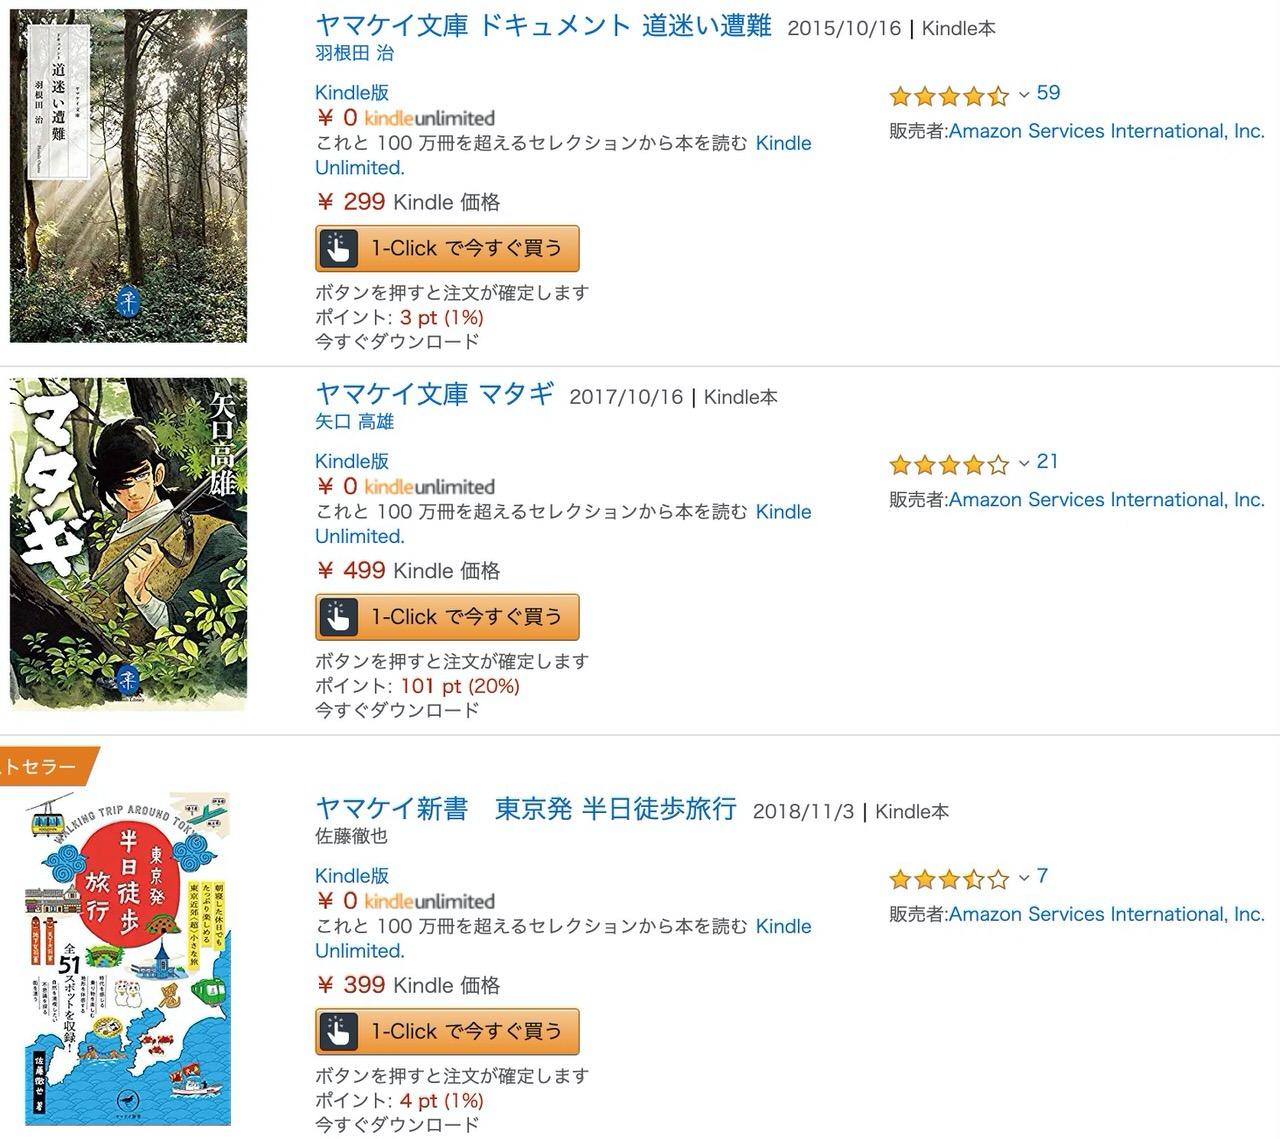 【Kindleセール】東京発 半日徒歩旅行・東京発 半日ゆるゆる登山など「ヤマケイ文庫・新書フェア」(3/26まで)